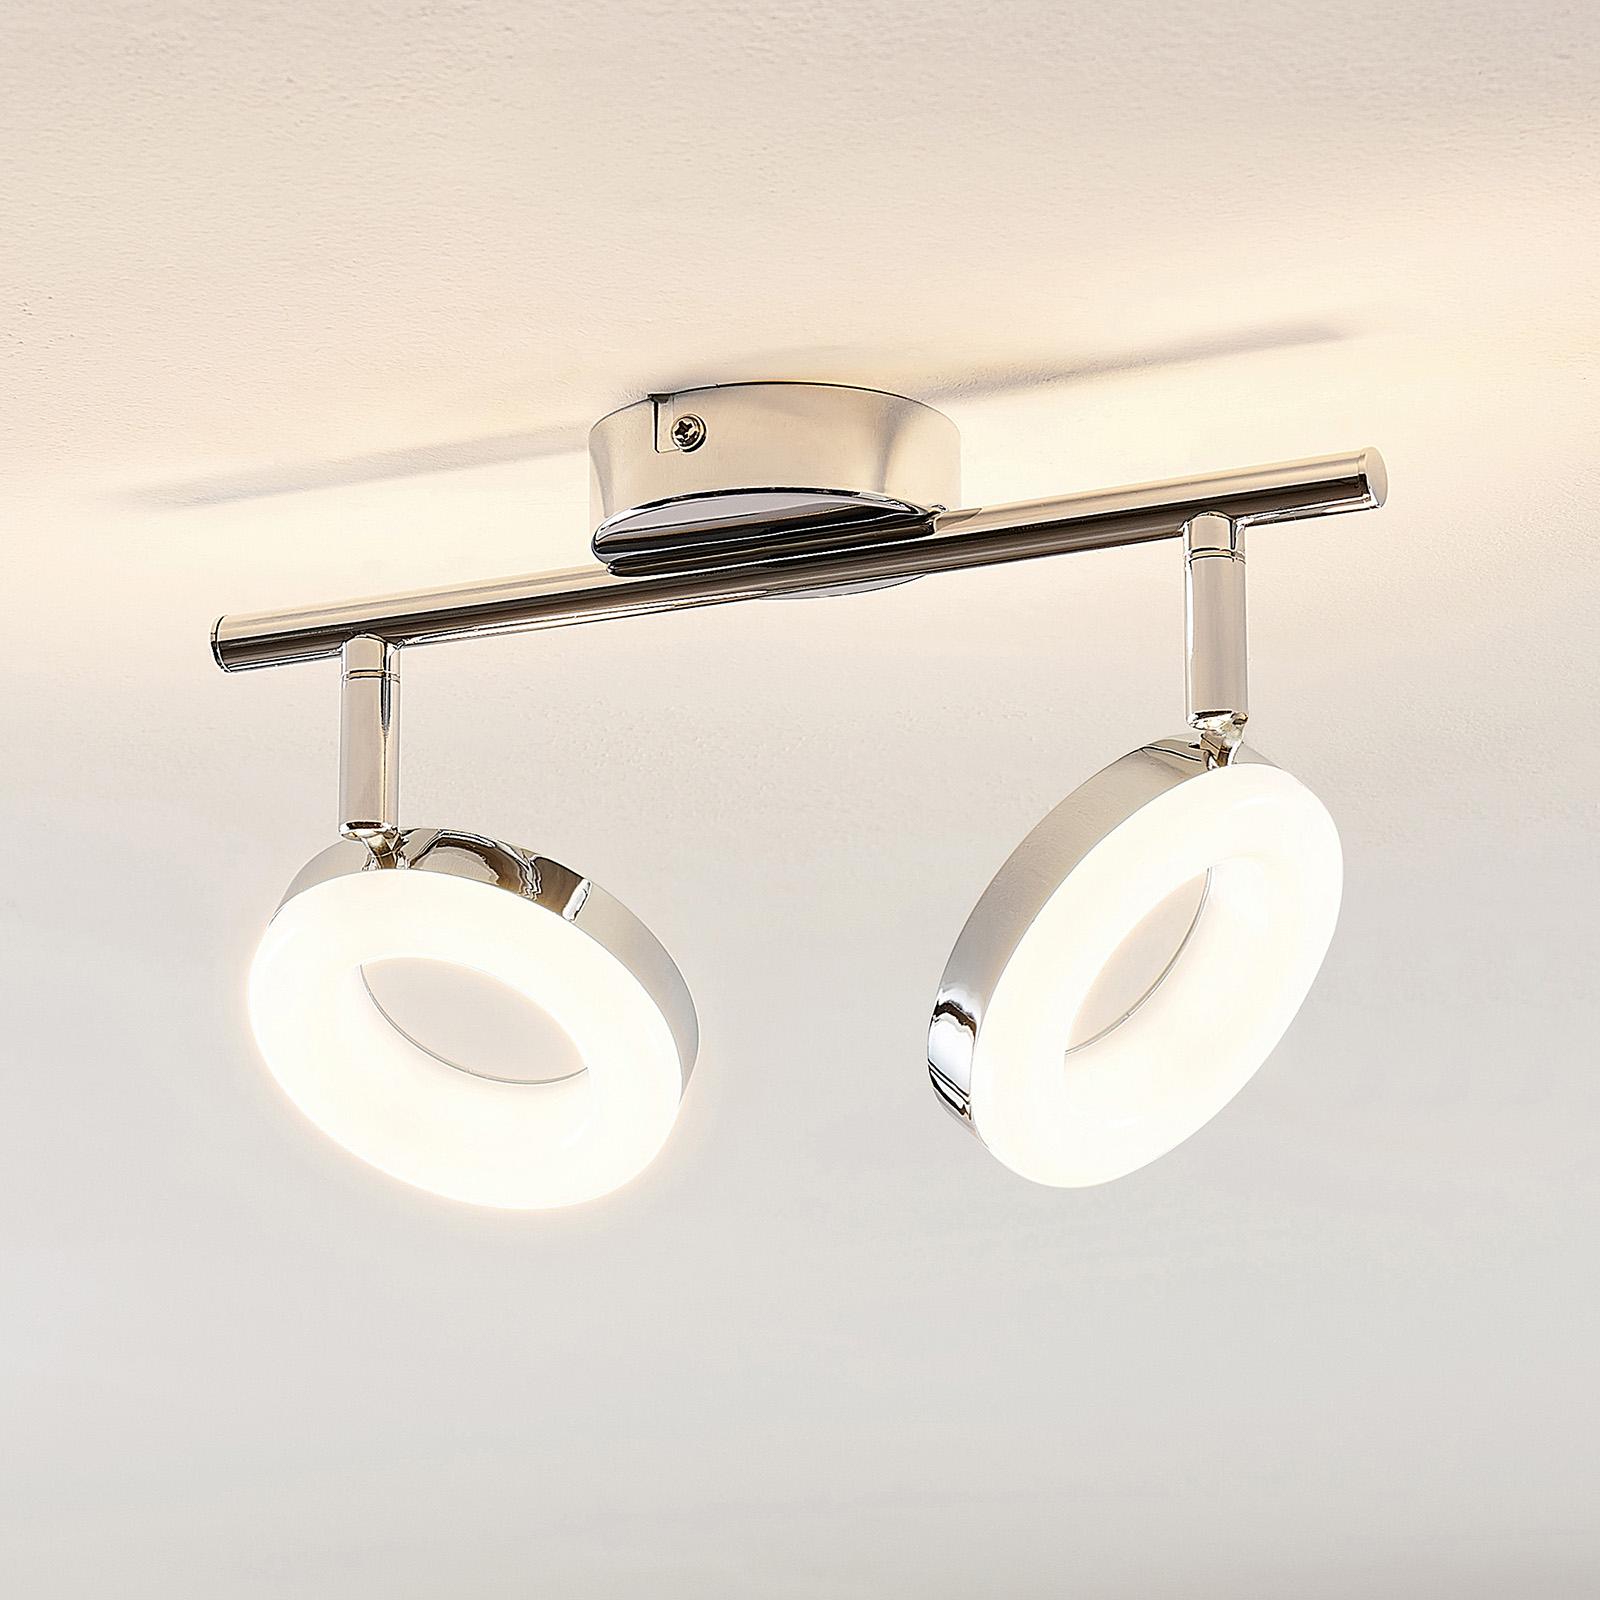 ELC Tioklia LED-taklampa, krom, 2 lampor